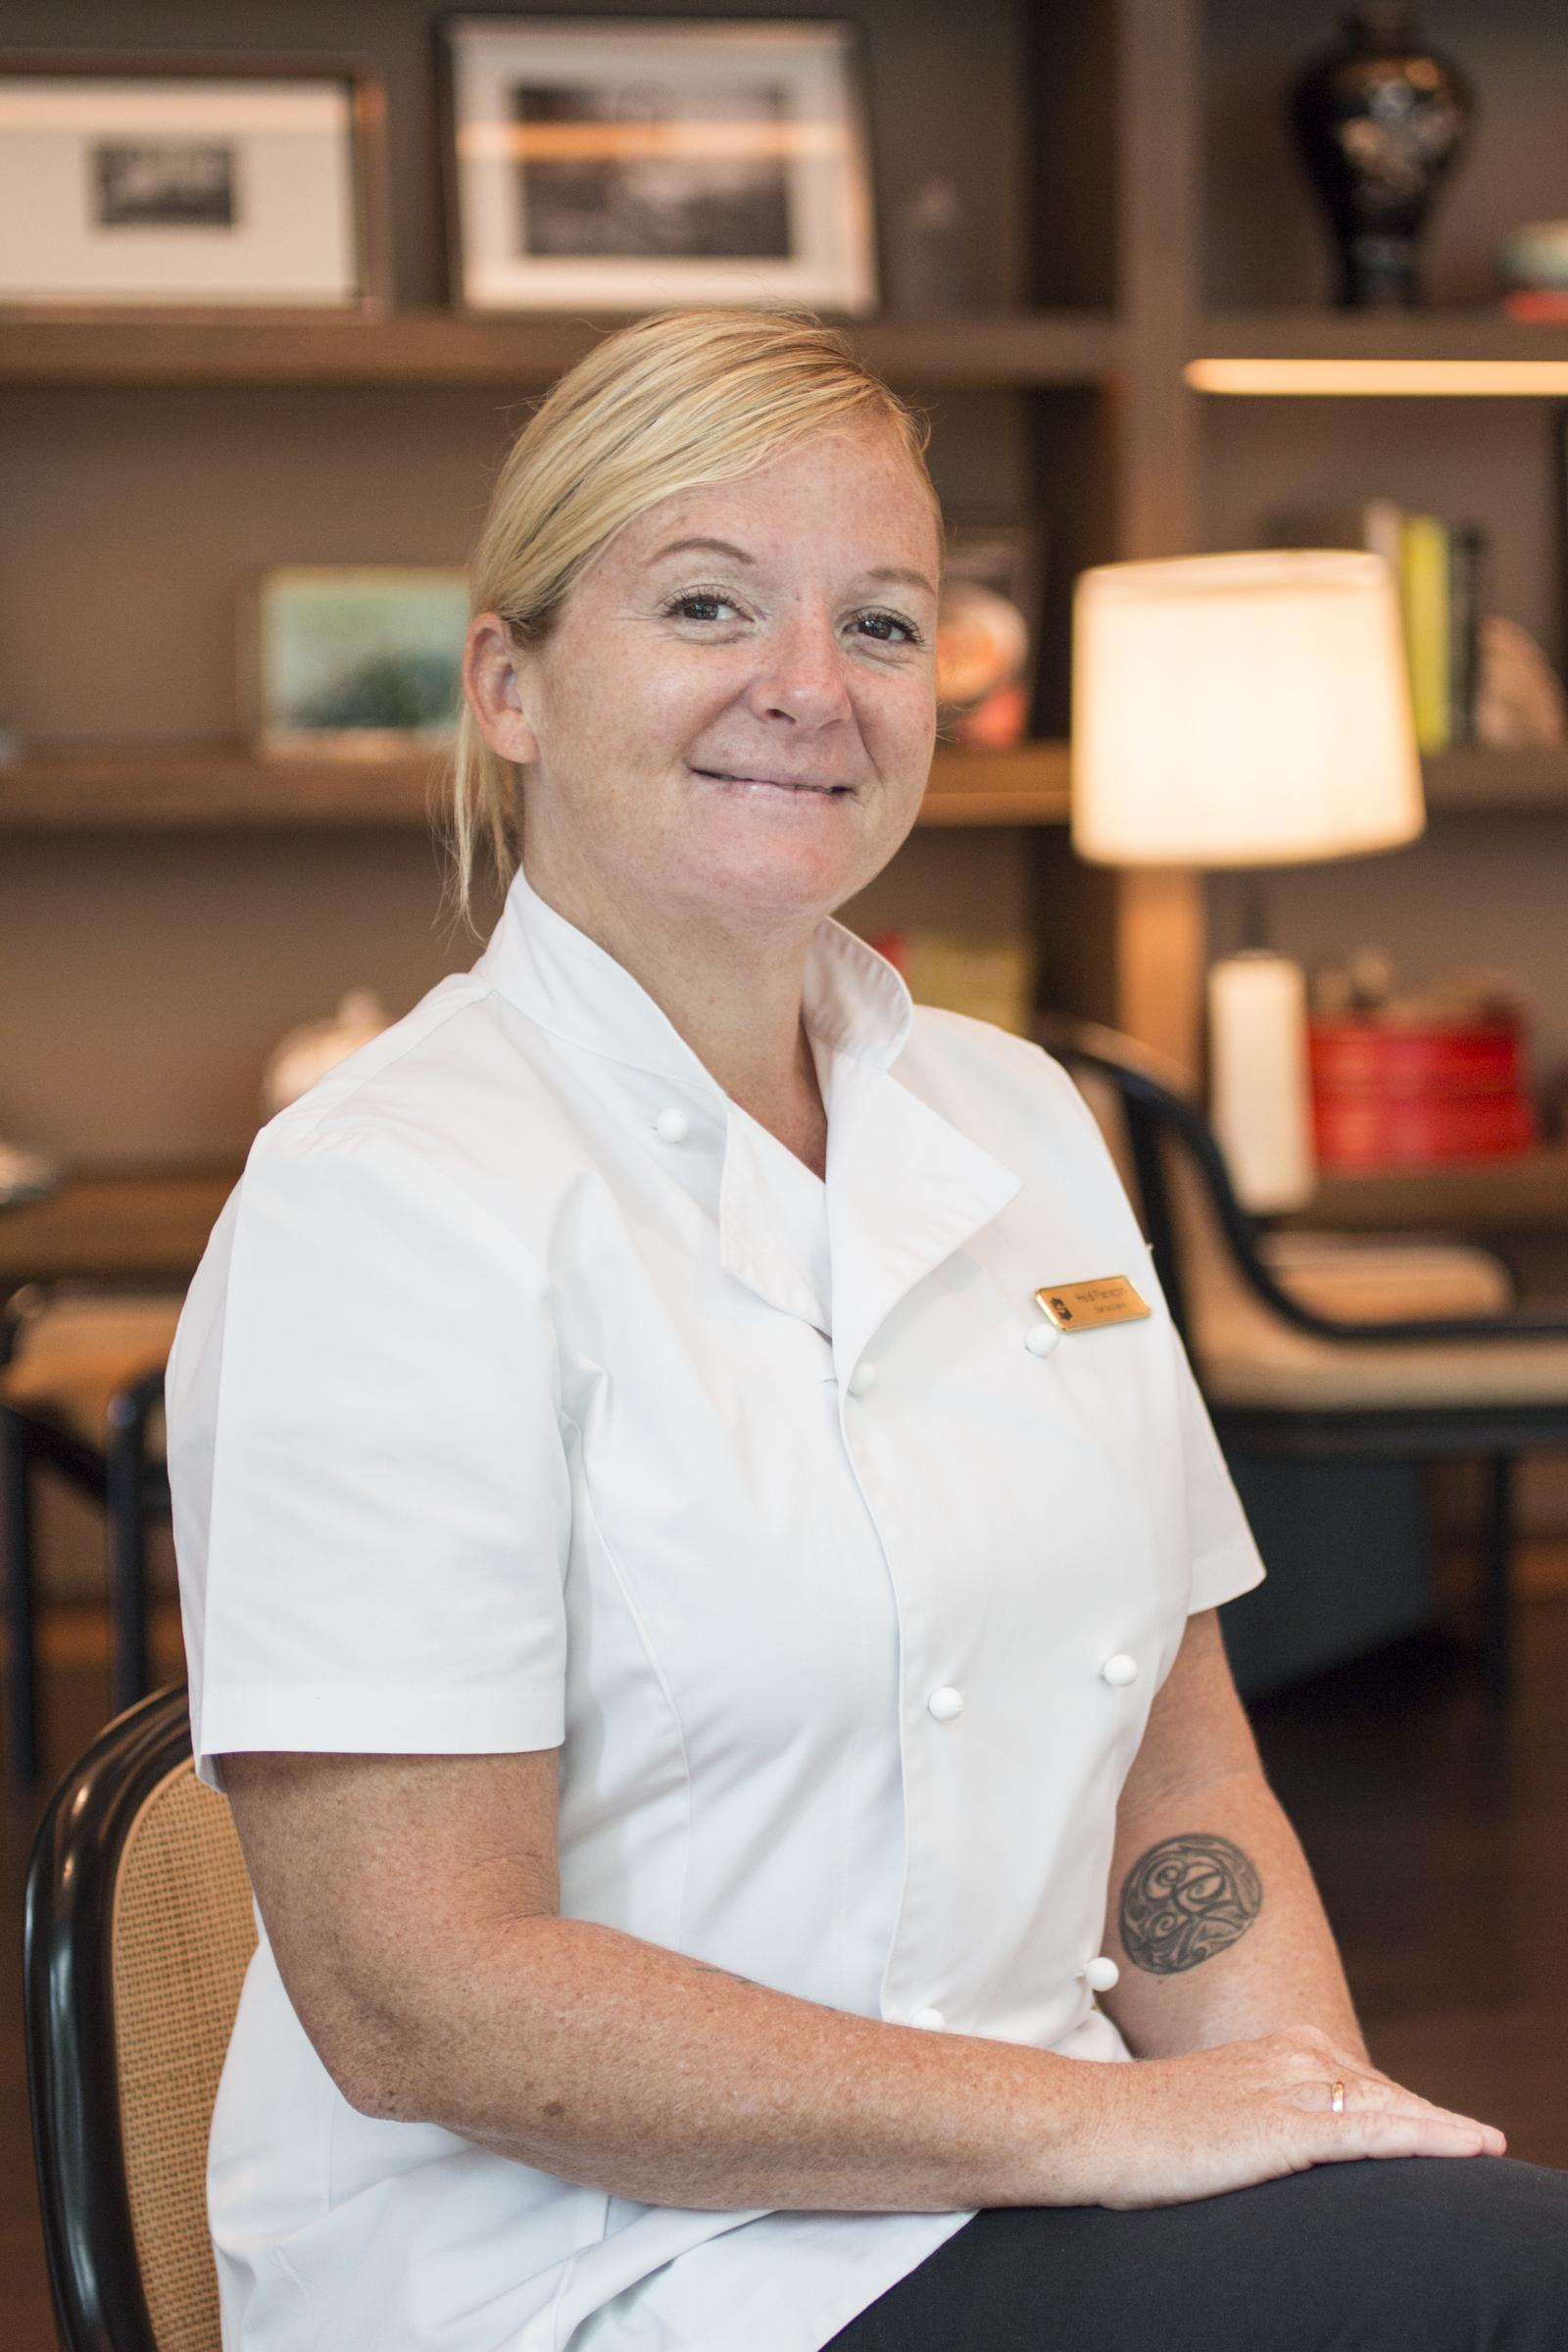 https://robert-parker-michelin-sg-prod.s3.amazonaws.com/media/image/2017/10/31/5ac7d29afa28425795a7fa8788eabb0d_Chef_Heidi-2.jpg